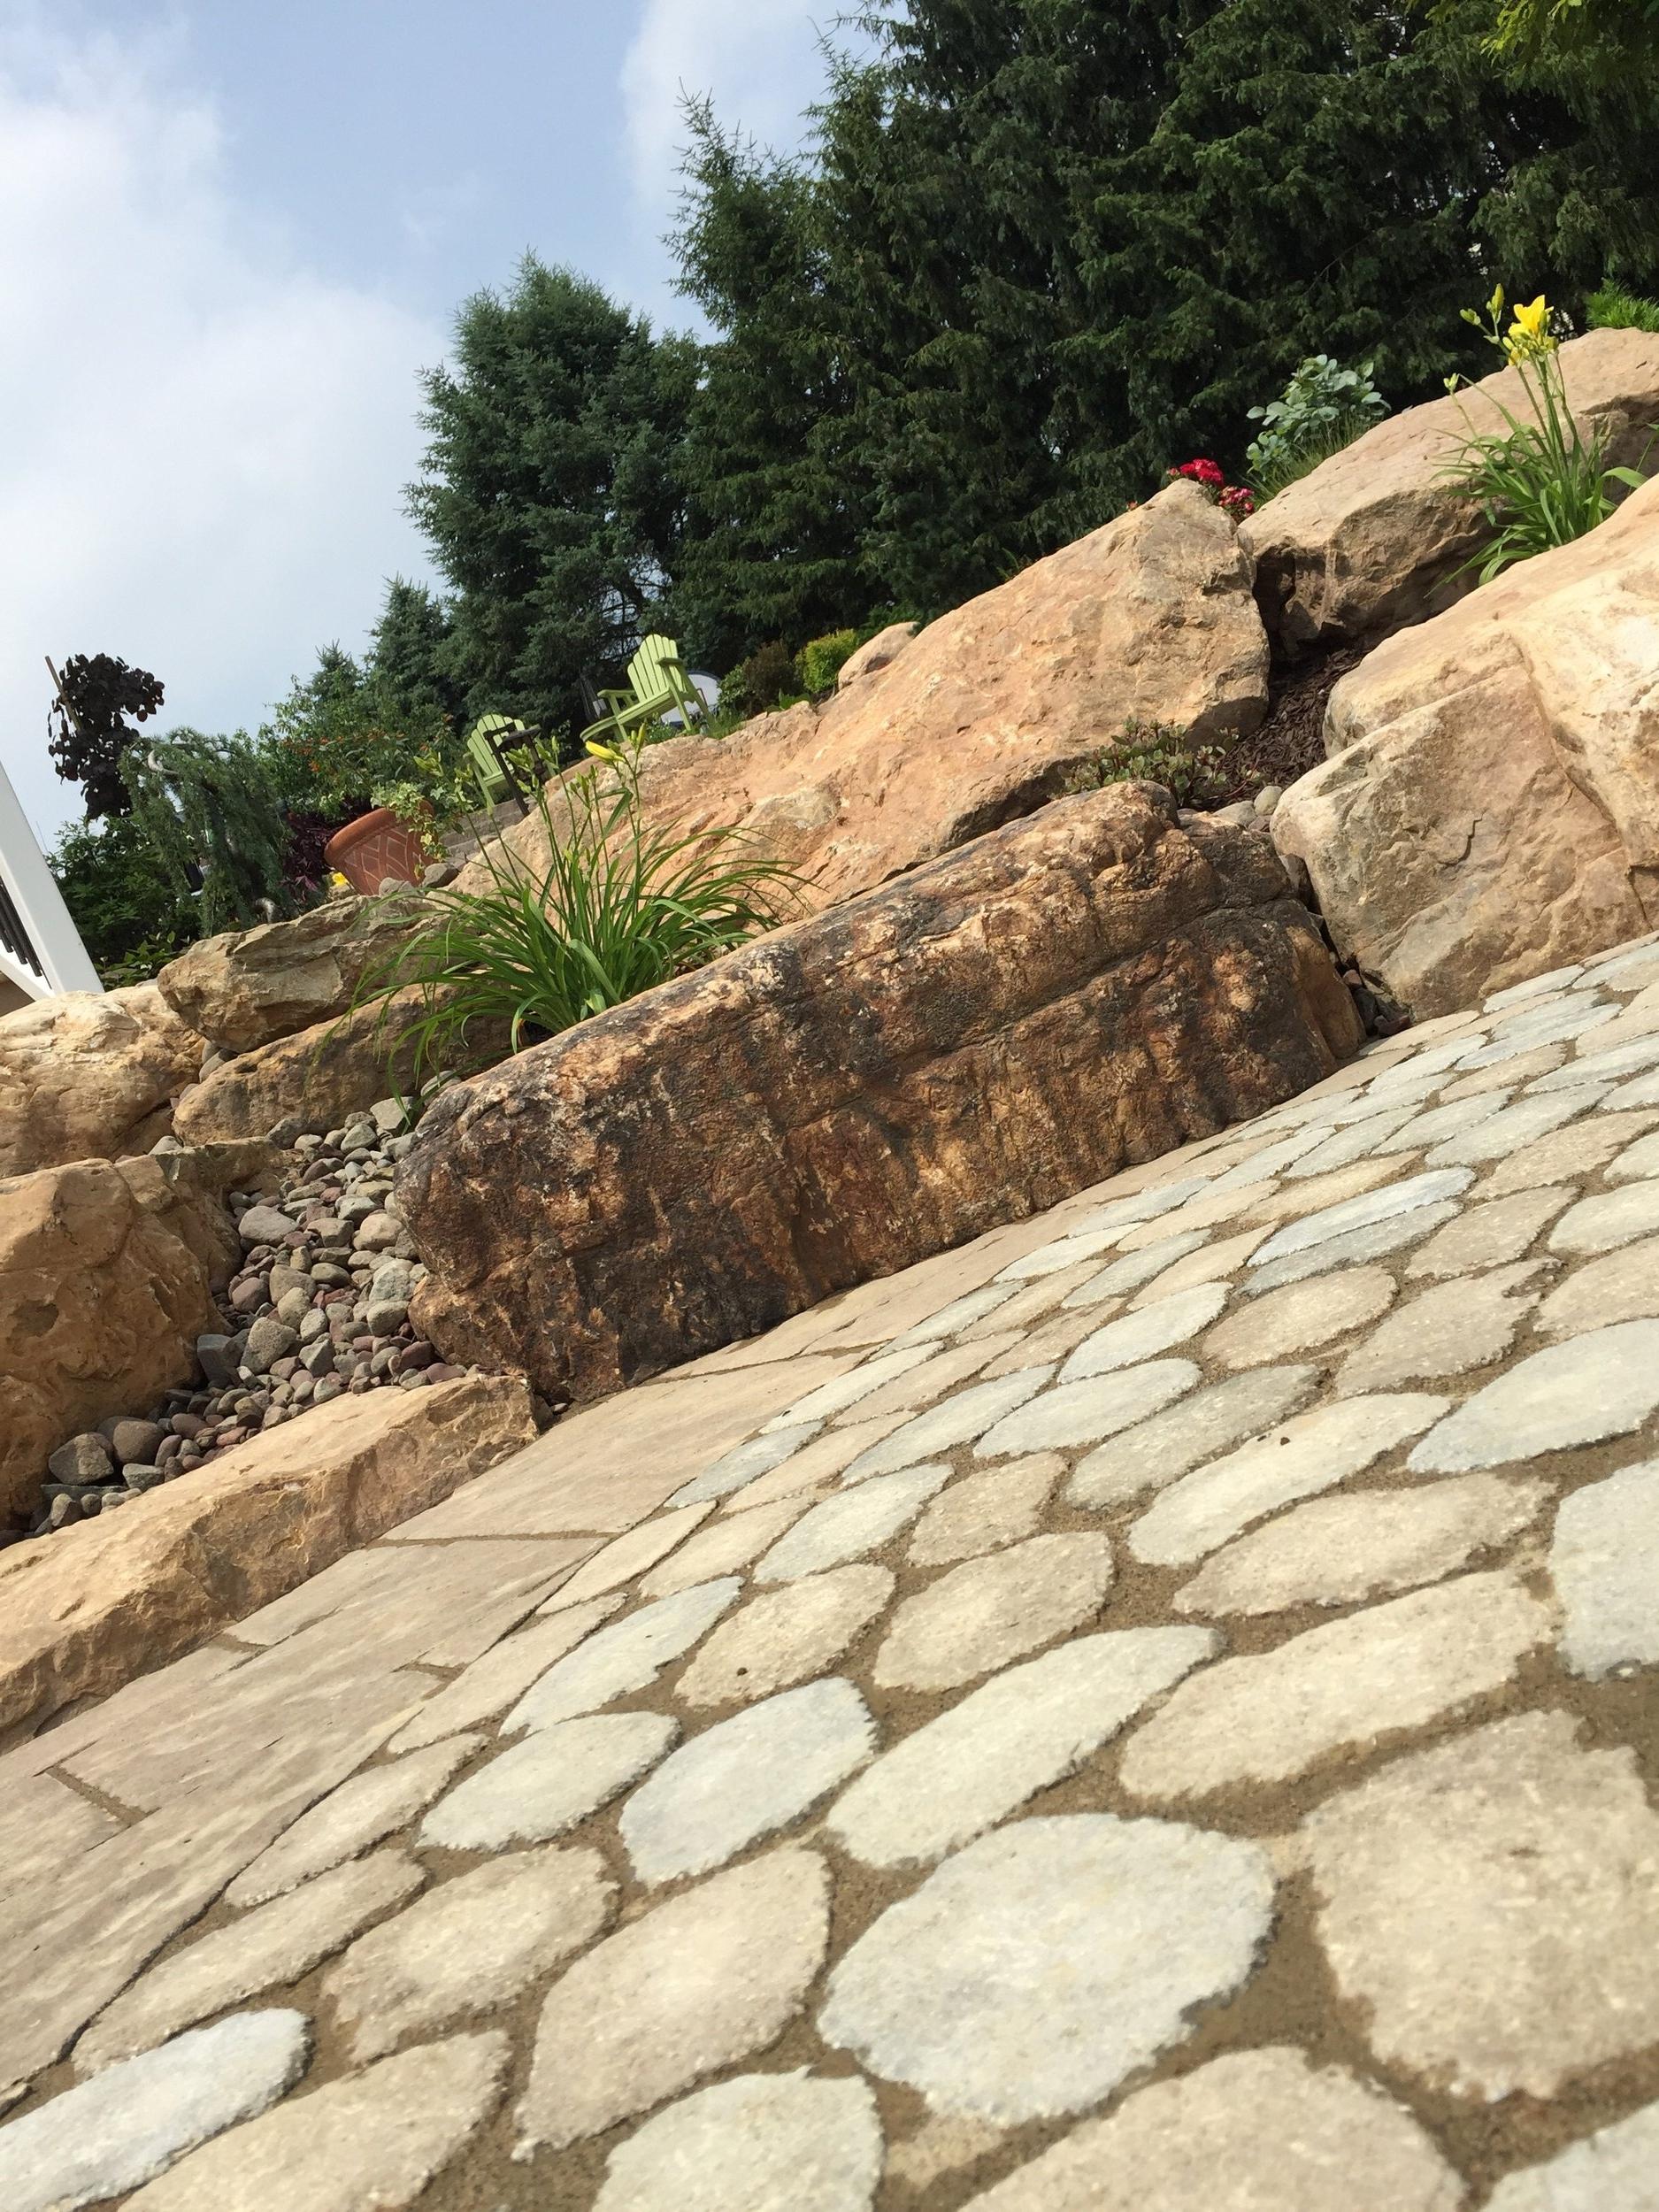 Professional landscape design with flagstone in Lebanon, PA